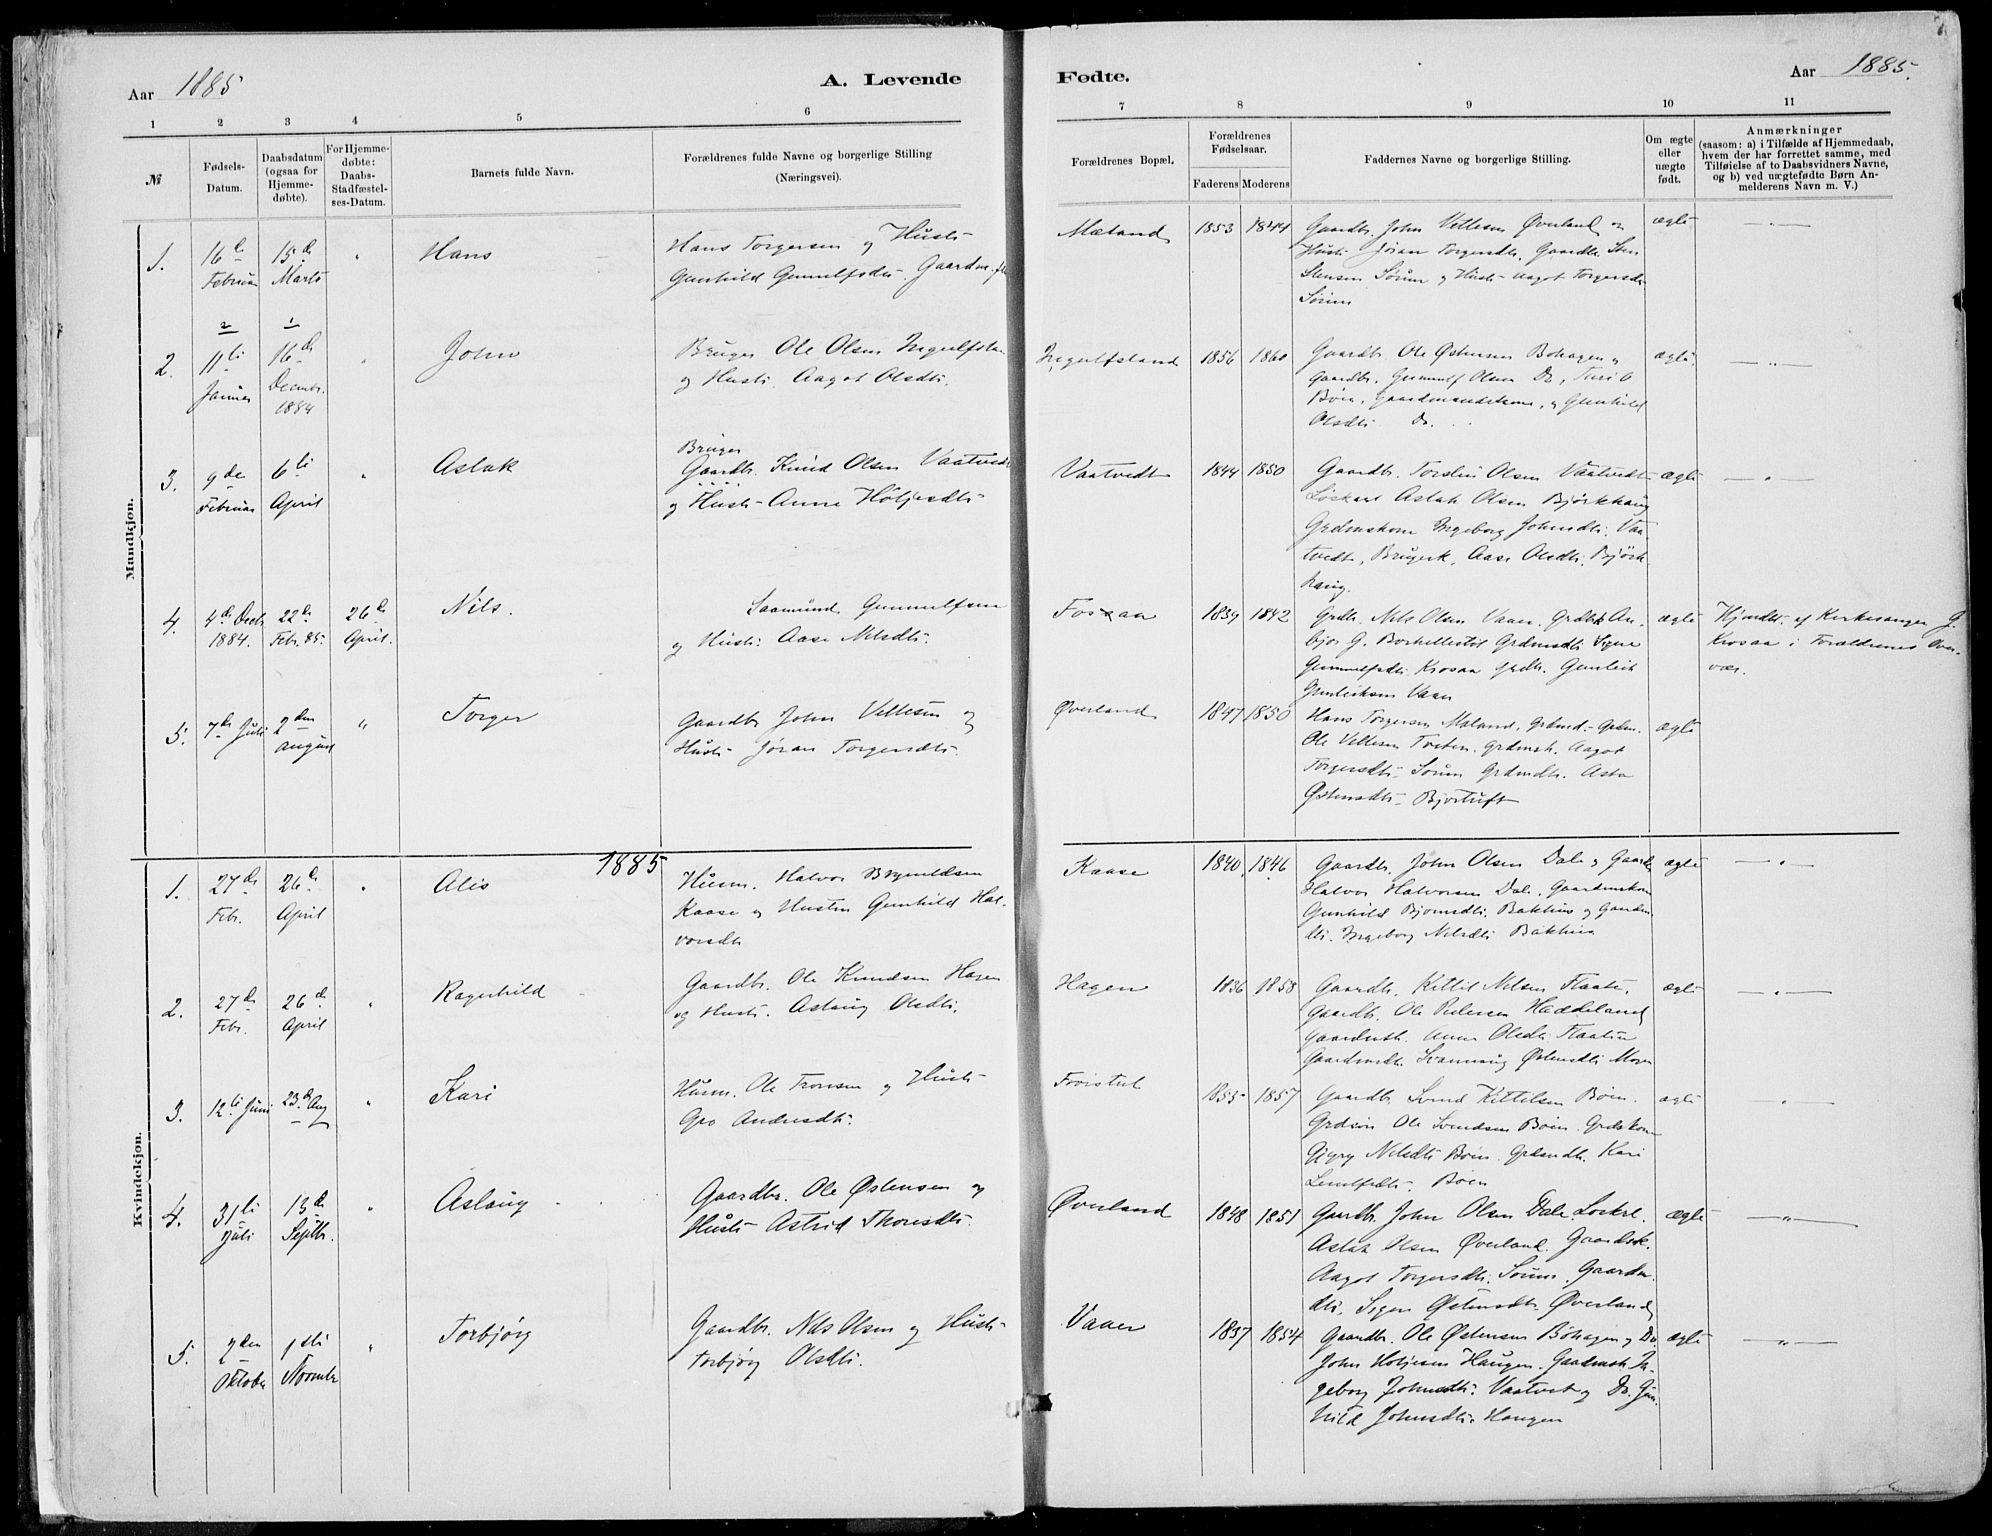 SAKO, Rjukan kirkebøker, F/Fa/L0001: Ministerialbok nr. 1, 1878-1912, s. 7